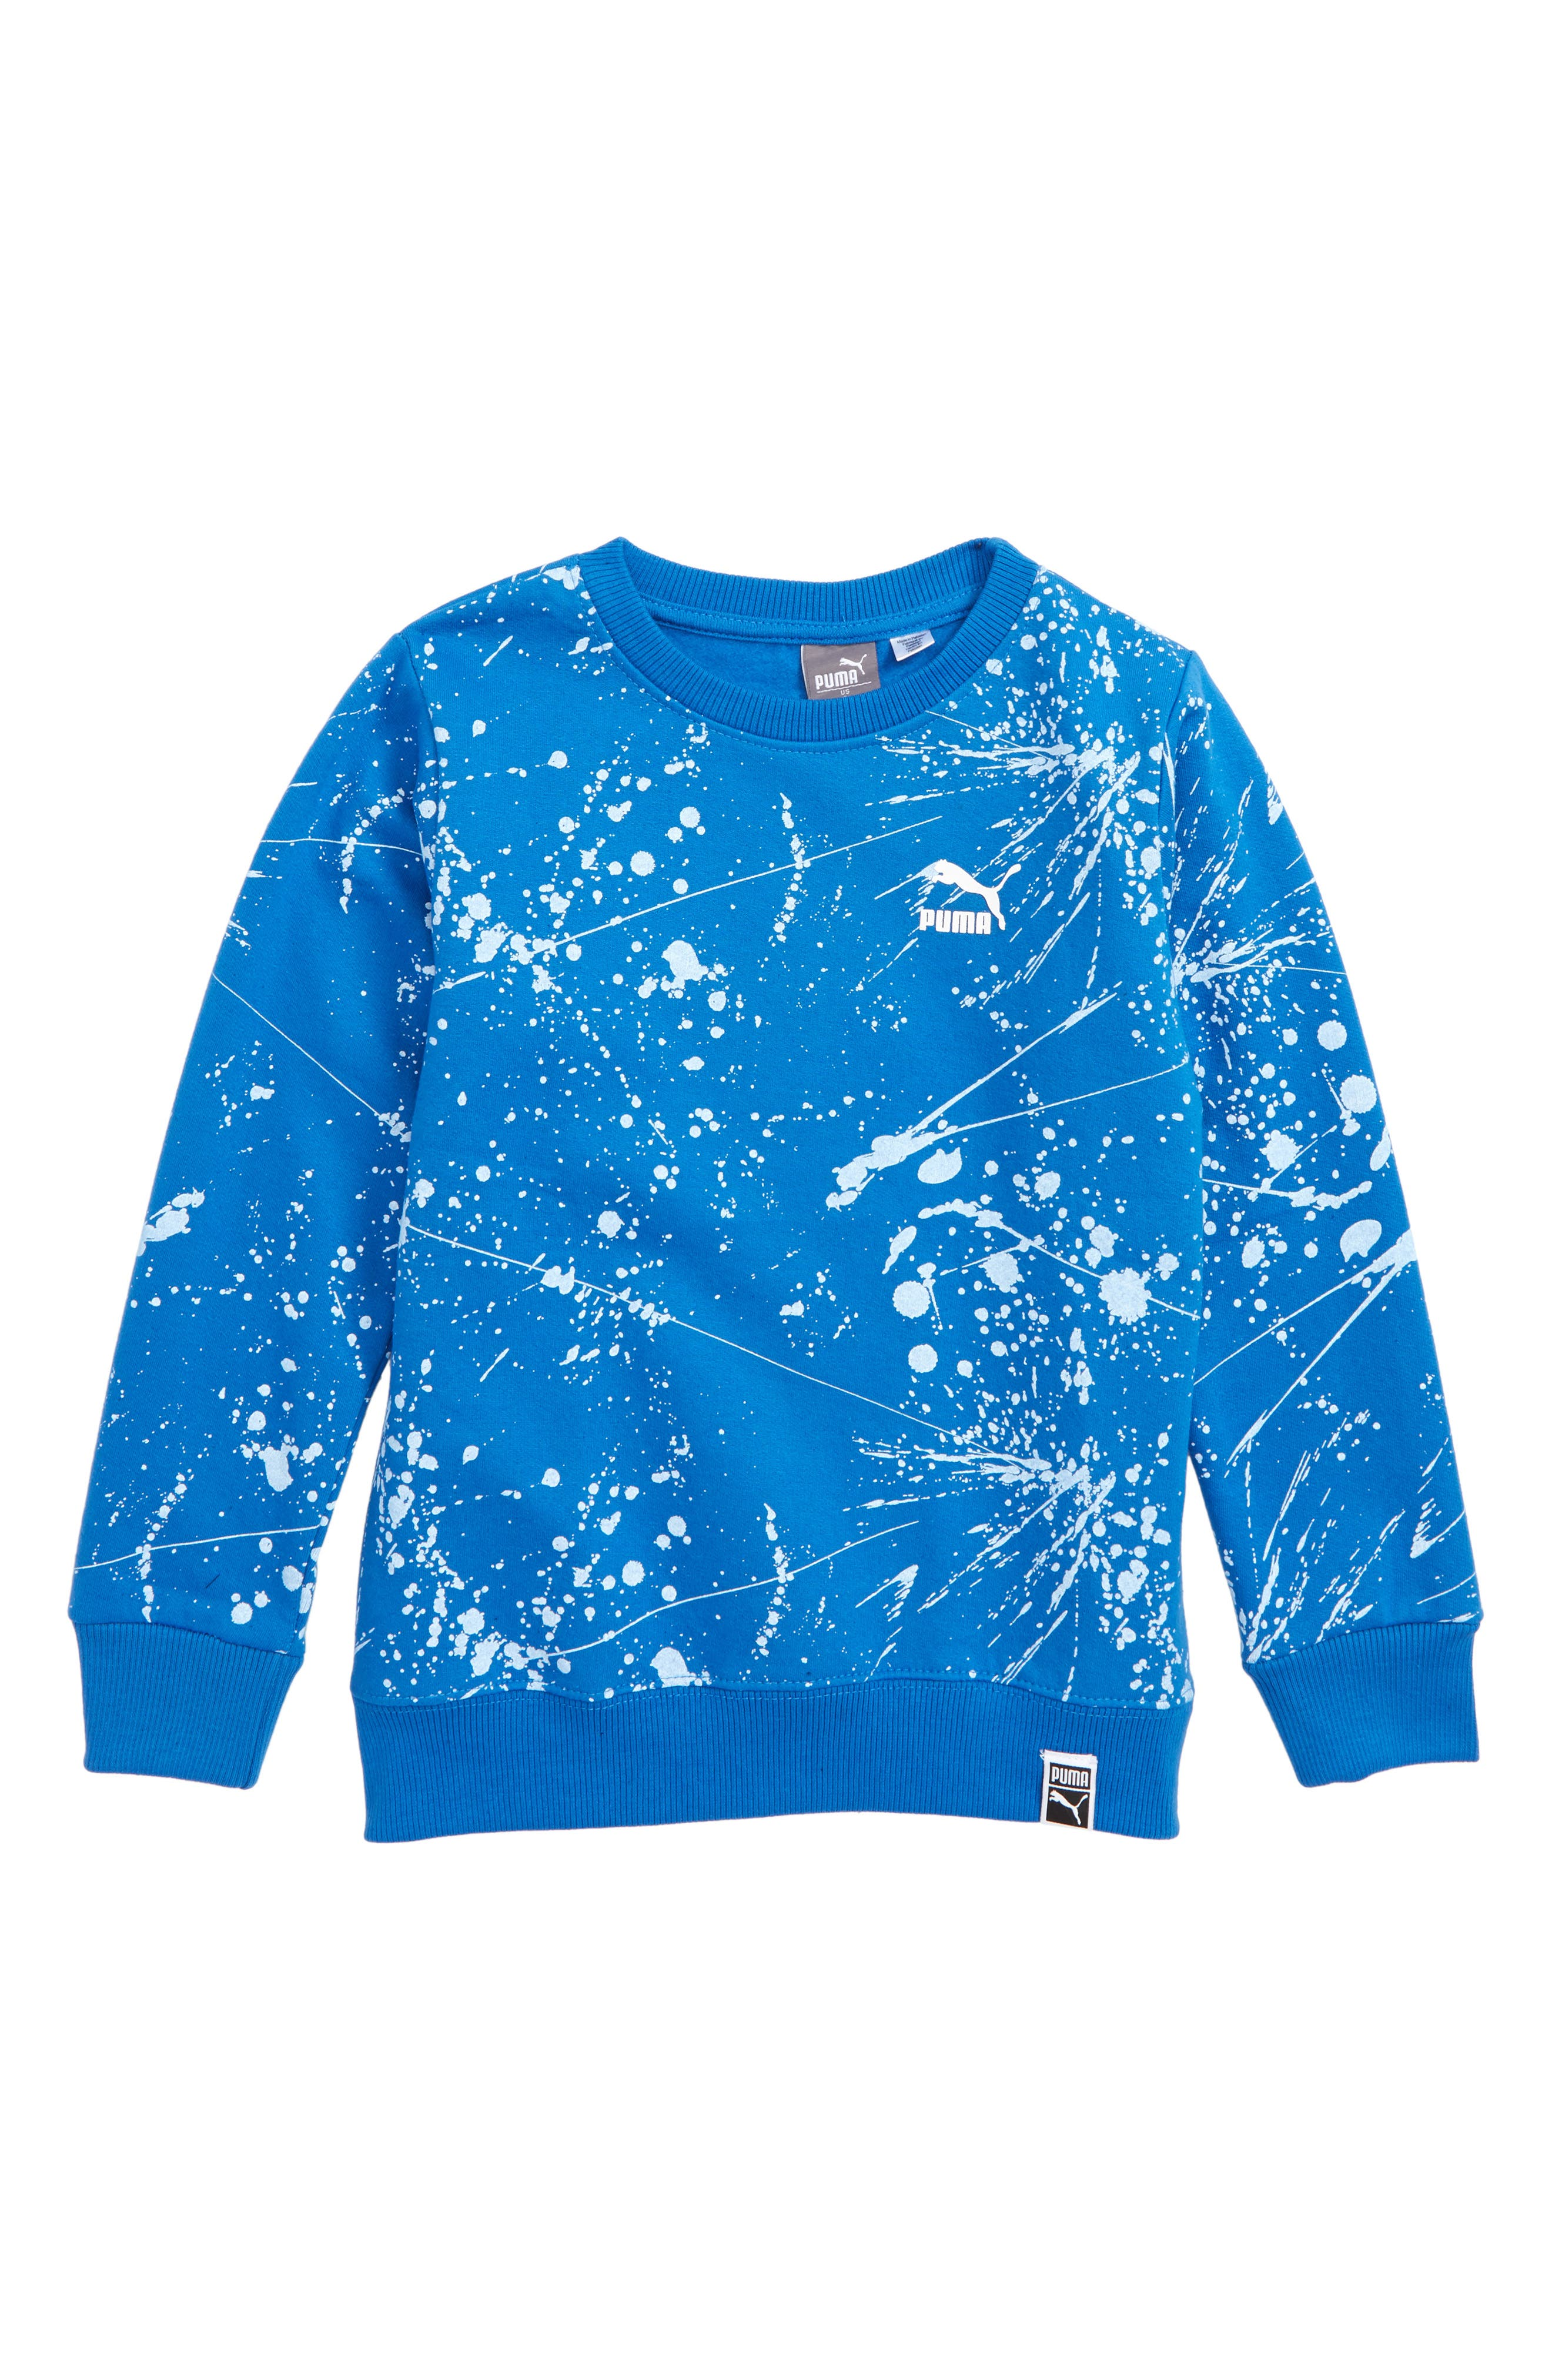 Splatter Fleece Sweatshirt,                         Main,                         color, STRONG BLUE